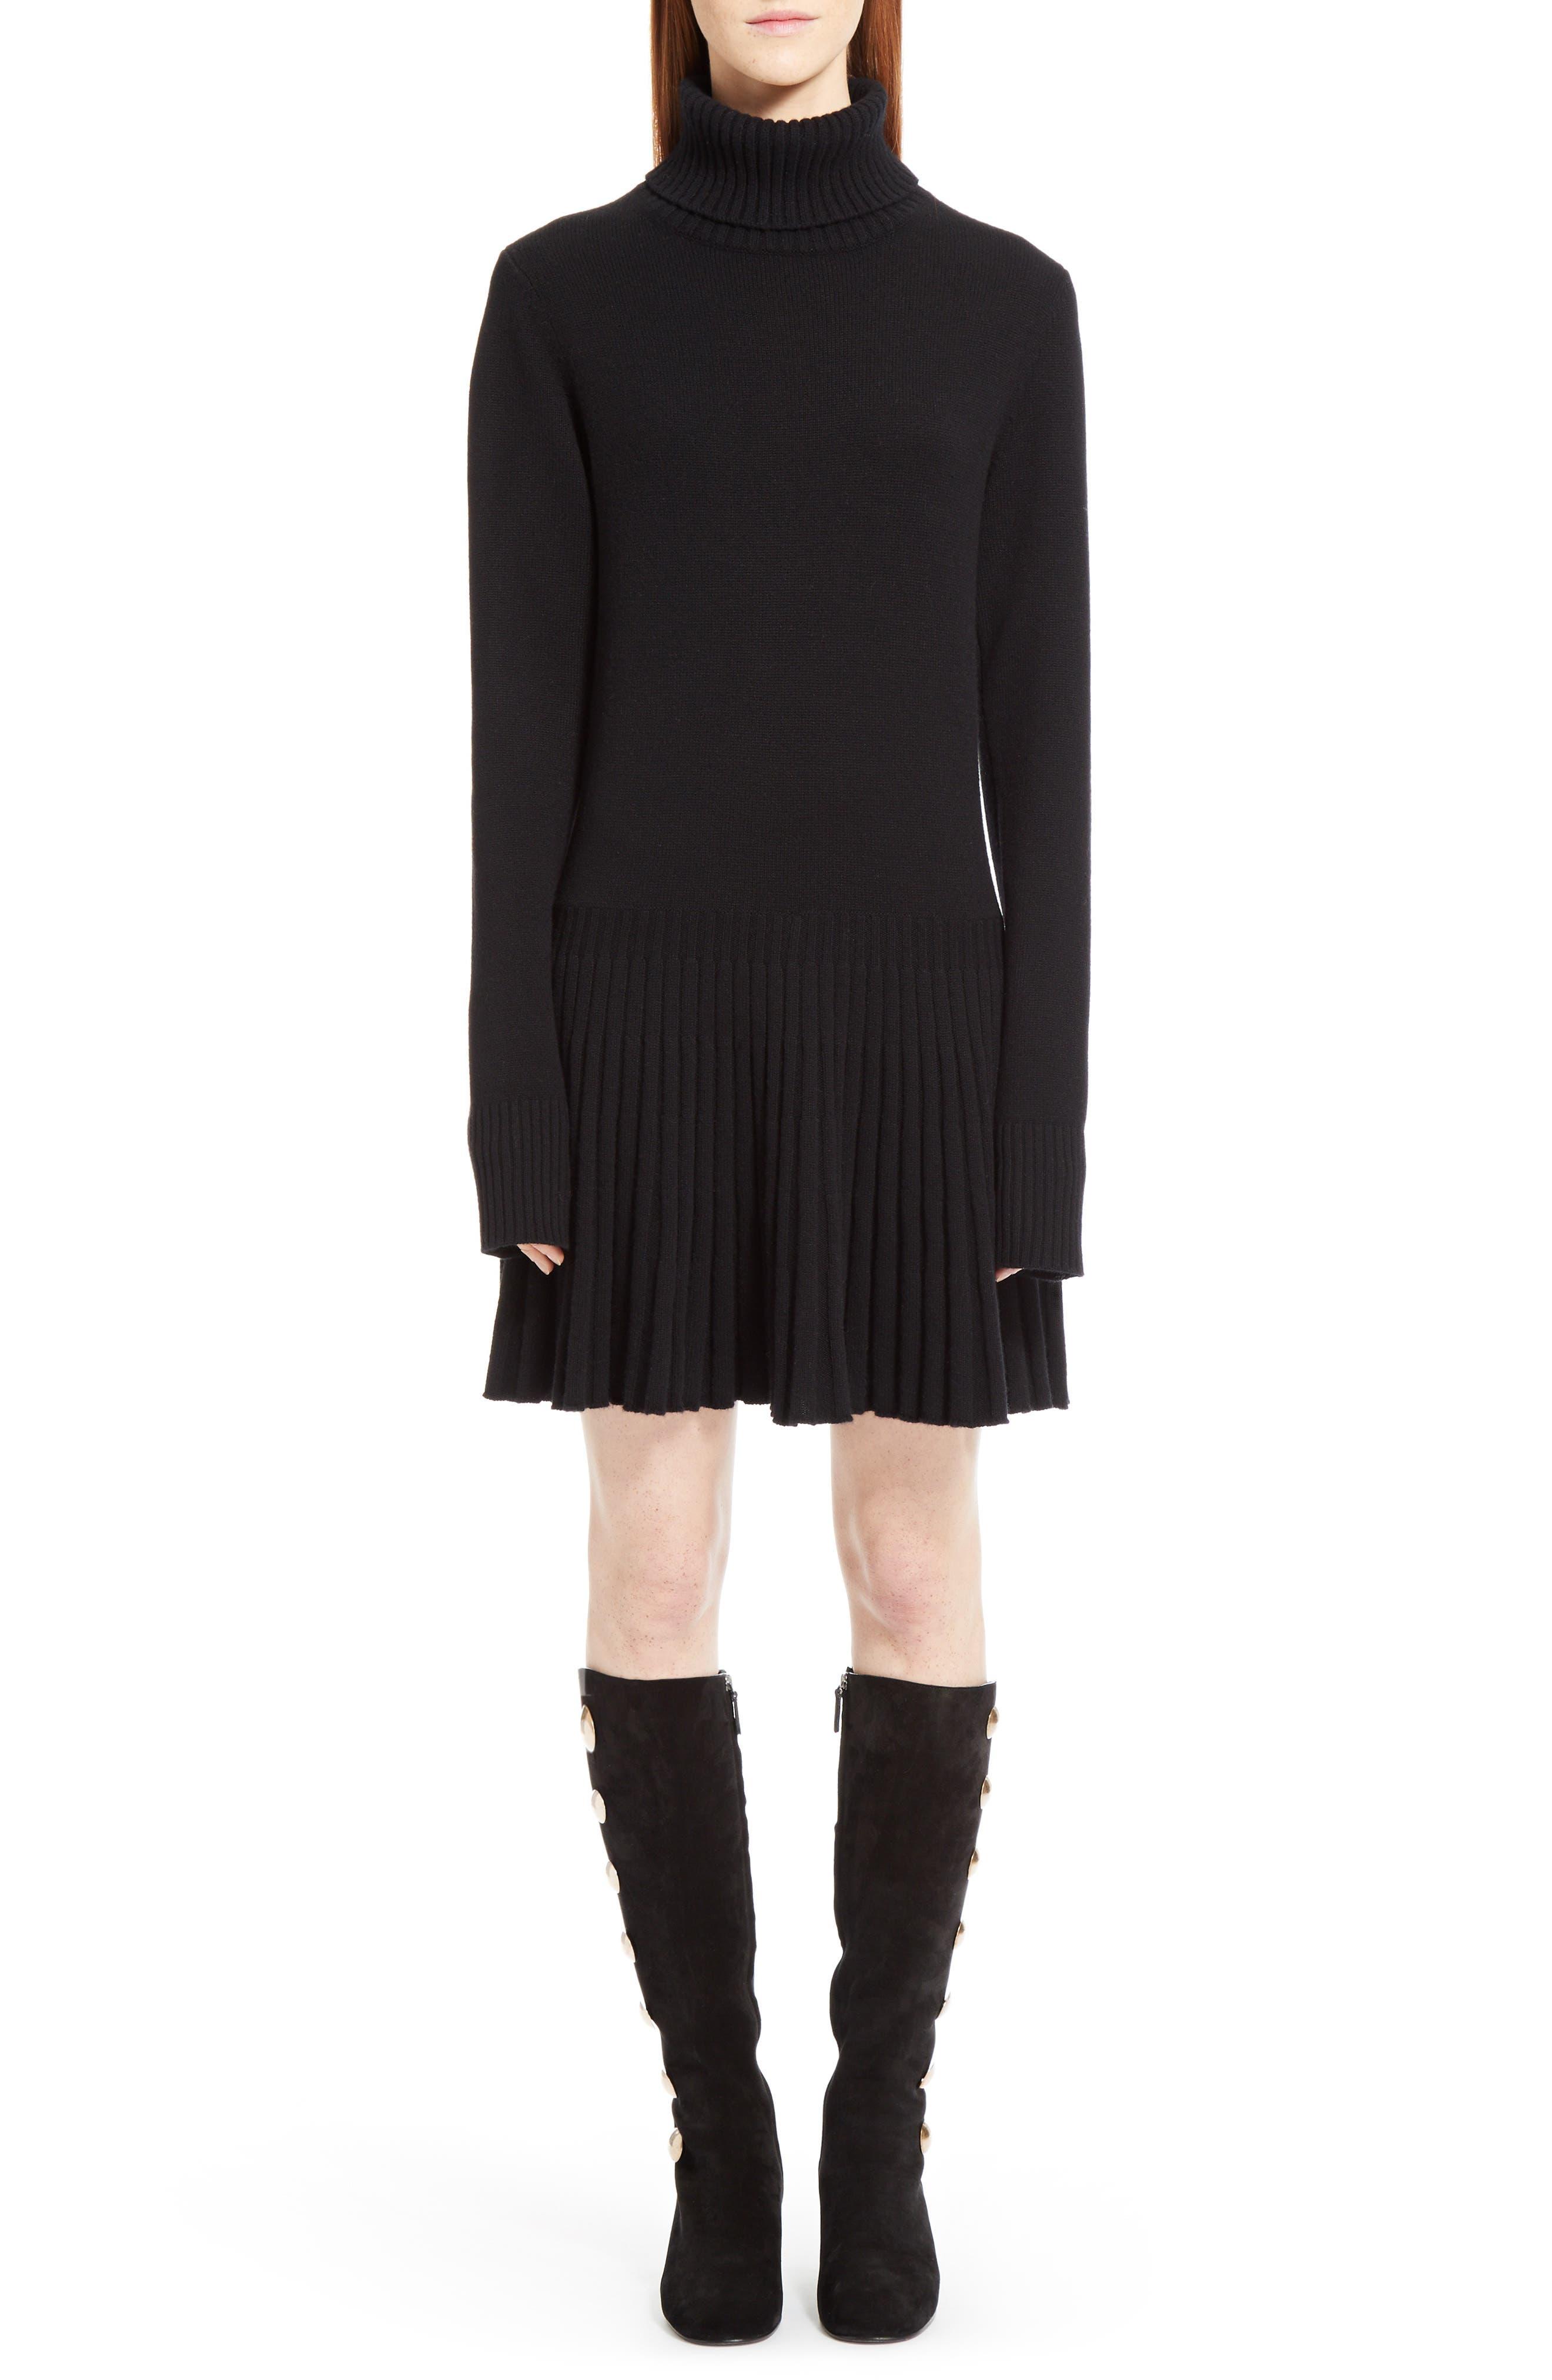 Alternate Image 1 Selected - Chloé Cashmere Pleated Turtleneck Dress